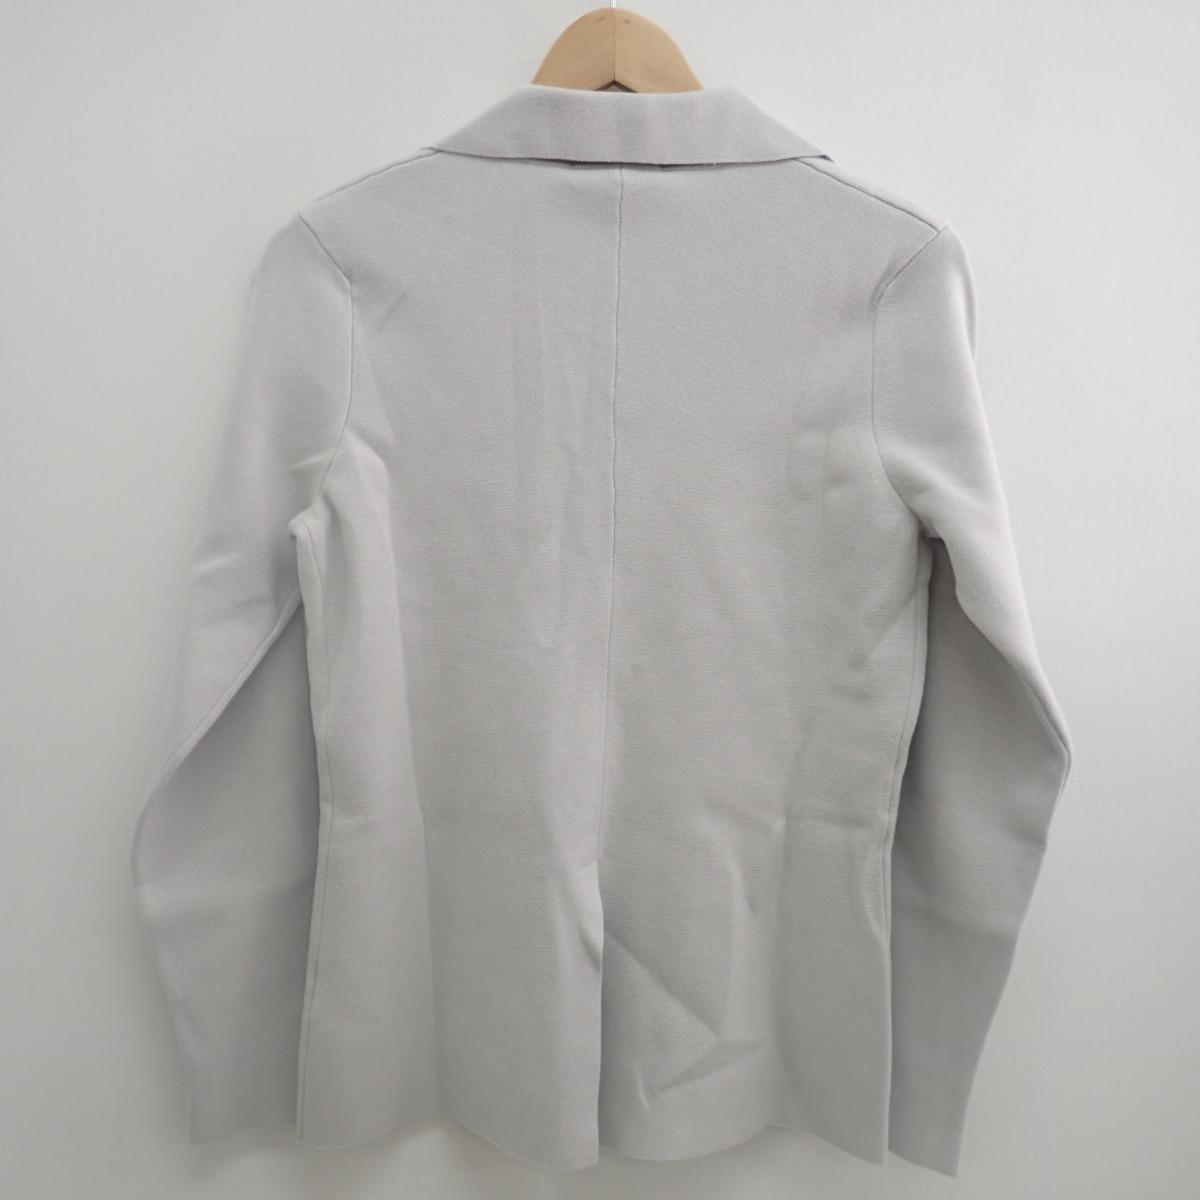 the best attitude 52342 847f5 Cruciani クルチアーニ CU5164 3B Milano-Rib Knit Jackets 3B Milan rib knit jacket  46 light gray men